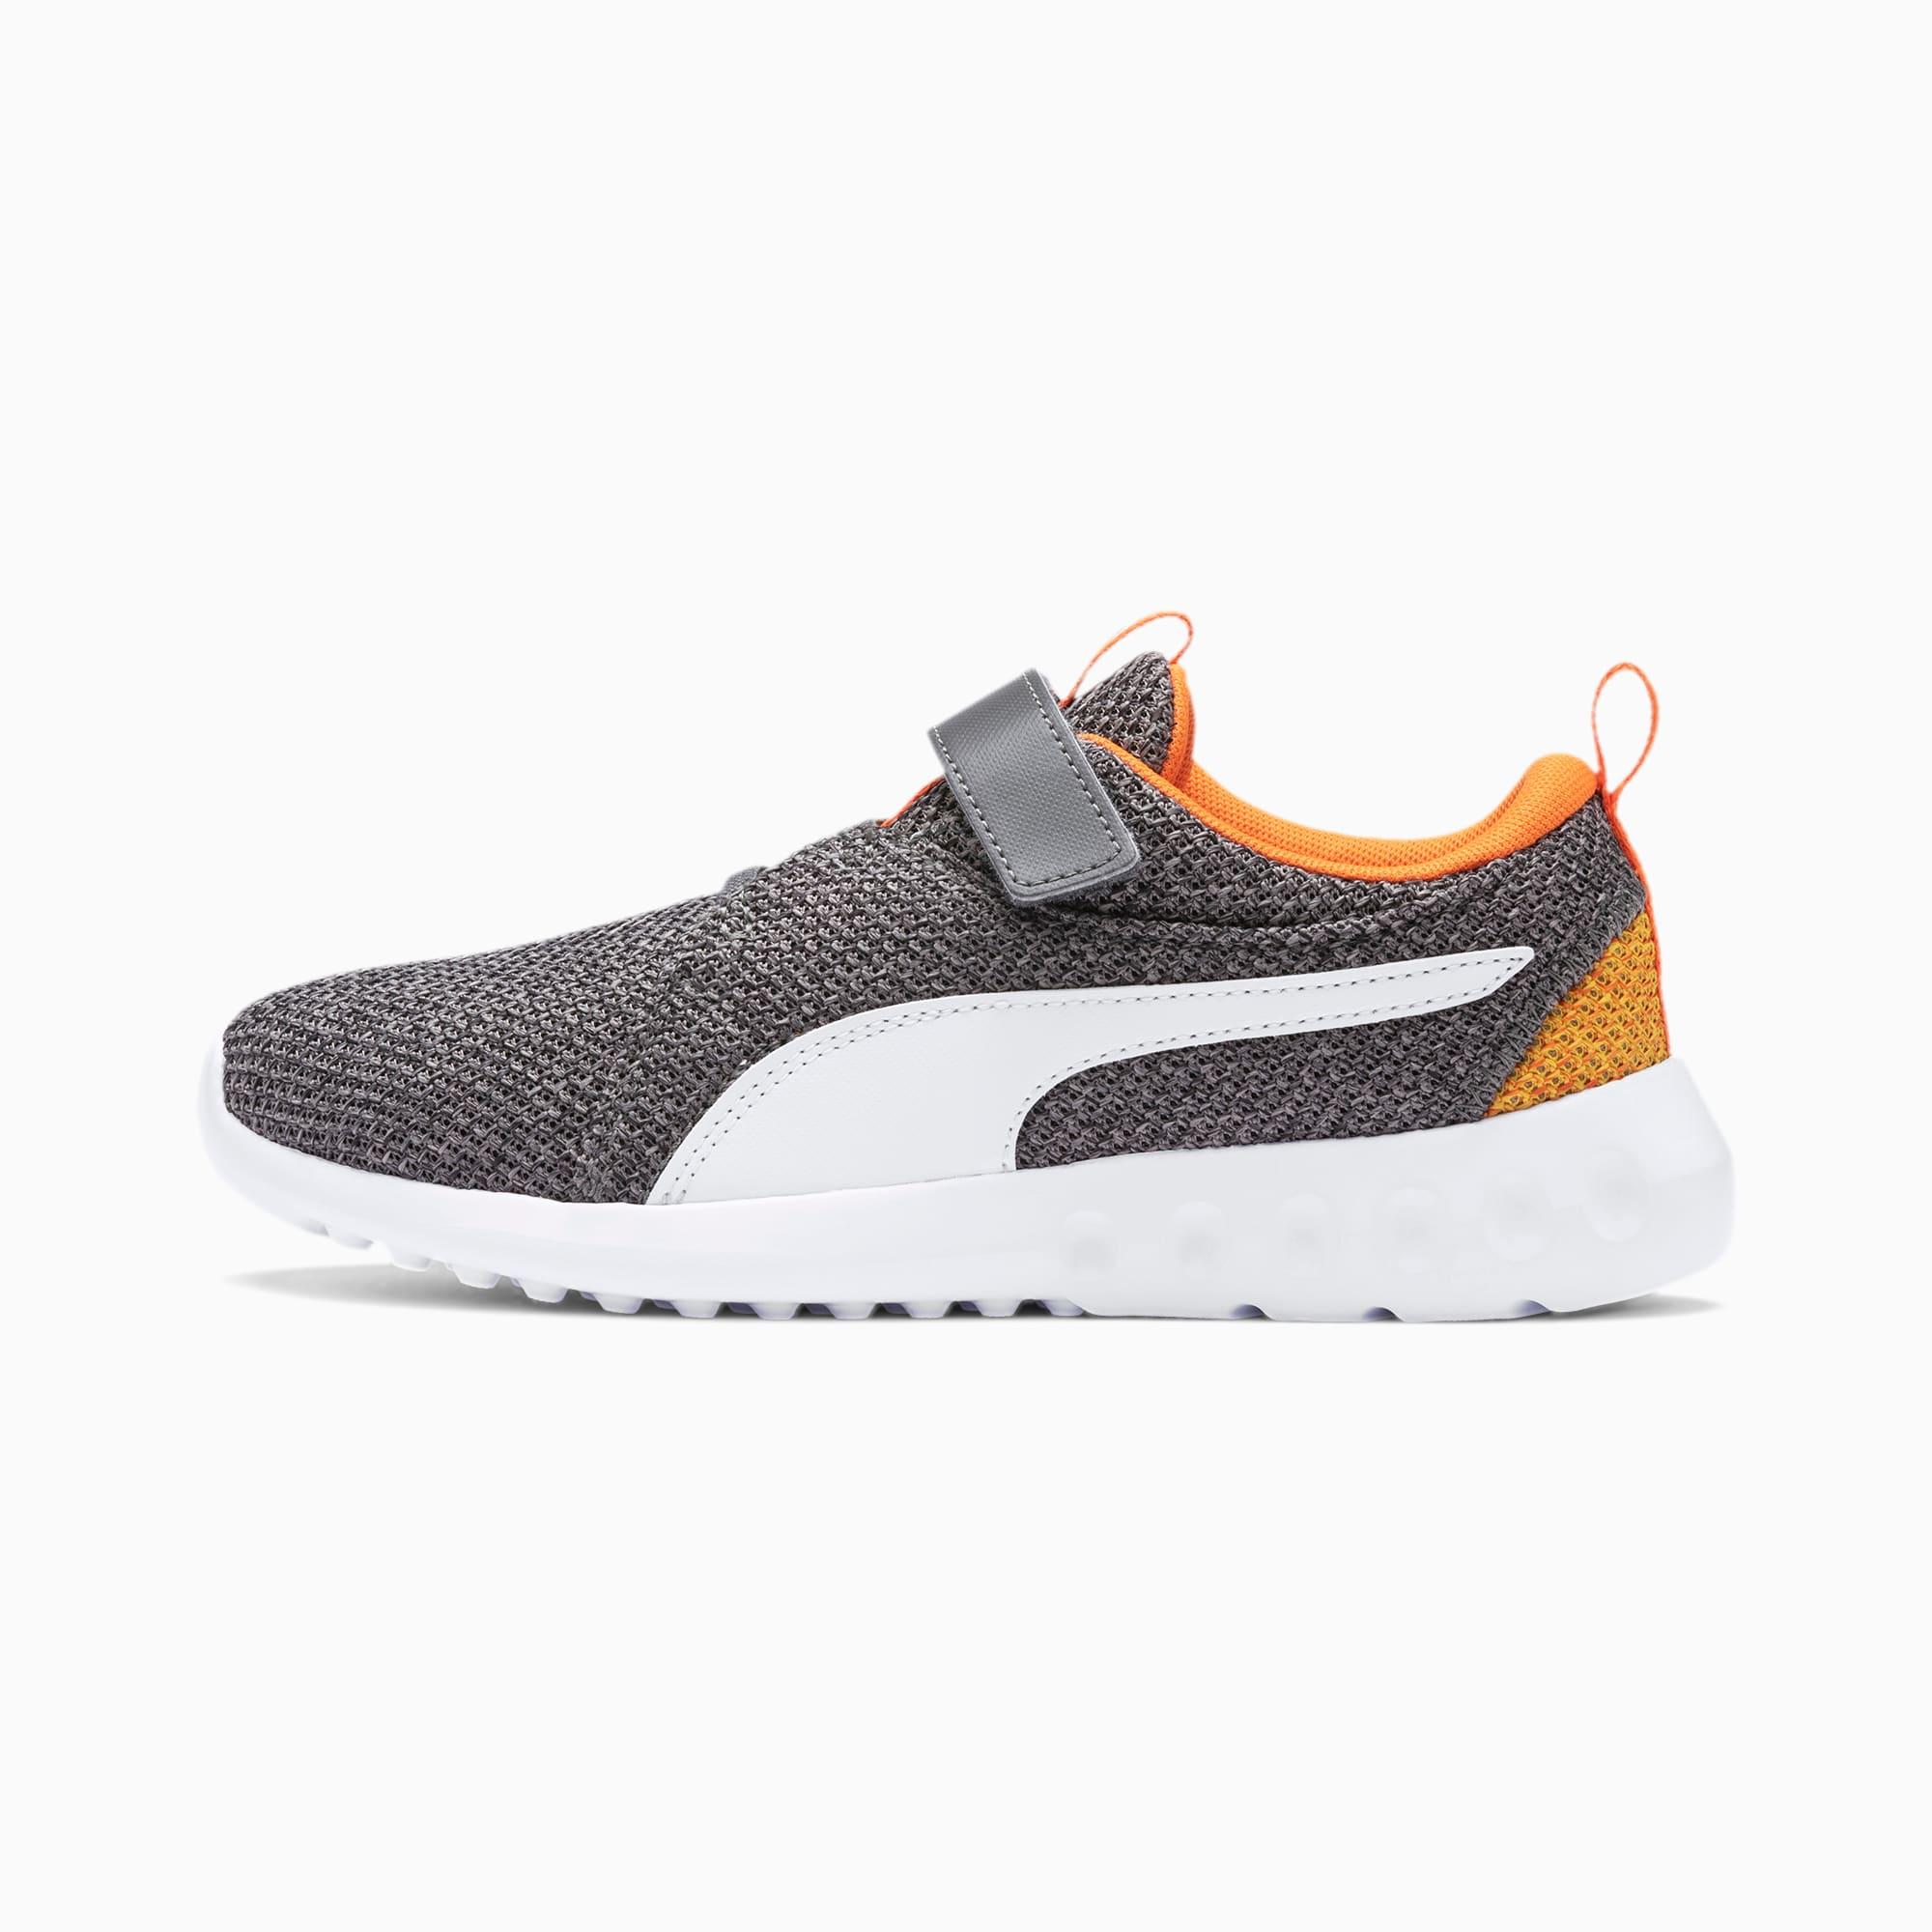 chaussure basket carson 2 bold knit v pour enfant, gris/blanc, taille 32, chaussures